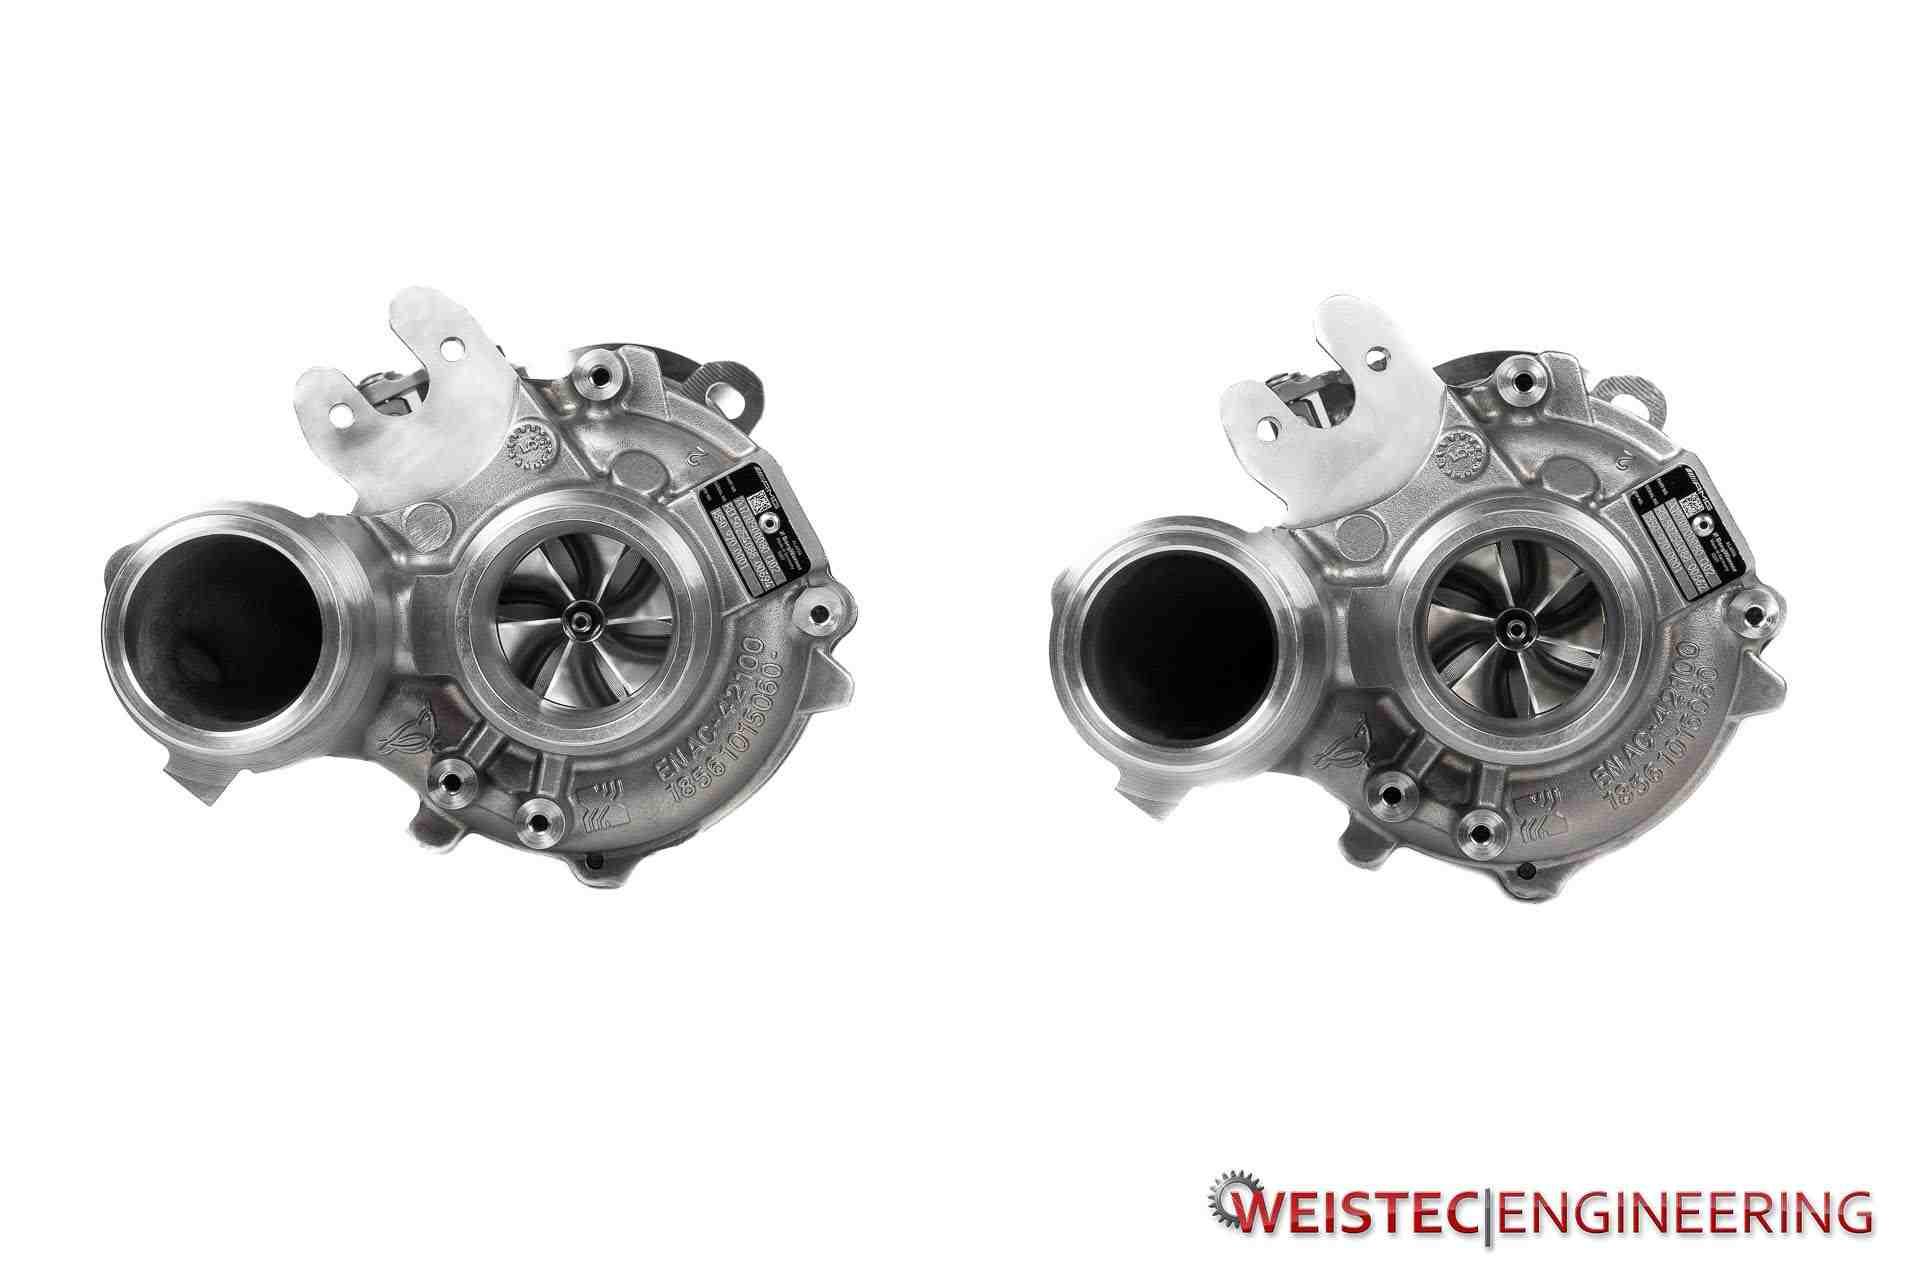 Weistec W 3 Turbo Upgrade, M177